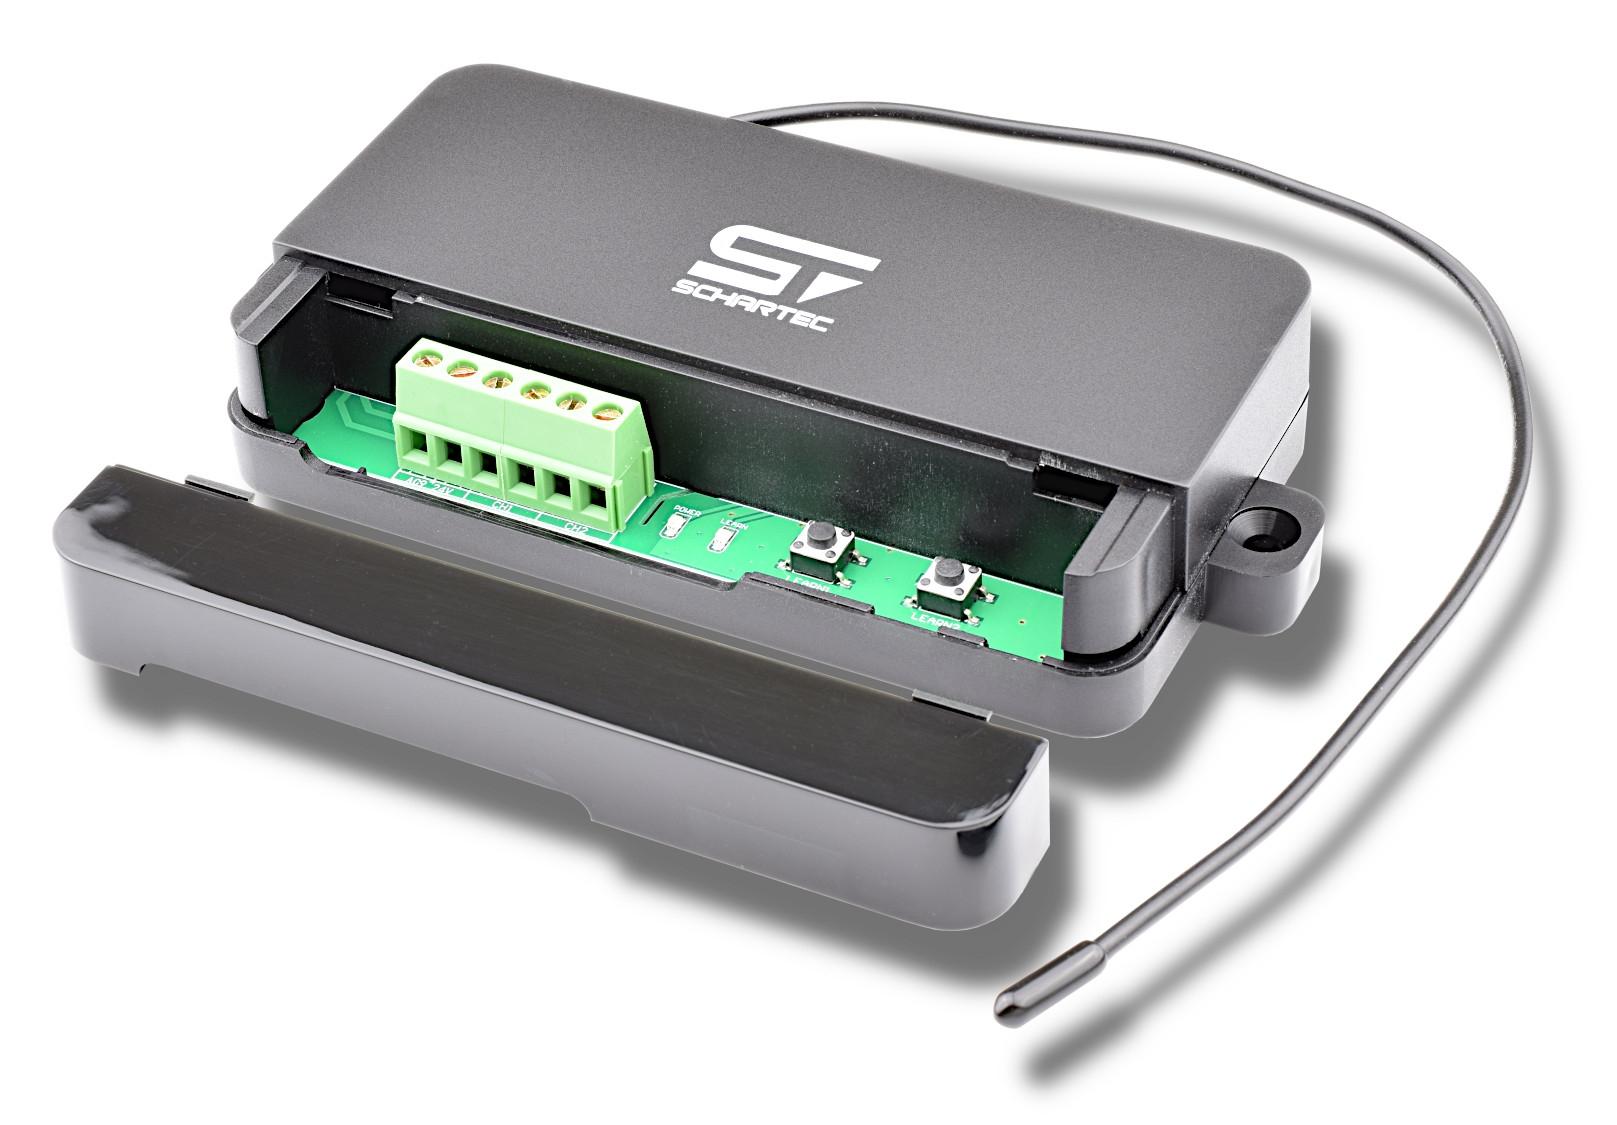 Hardware DIY & Tools Porte Jet Move Schartec Wireless Code Keypad ...